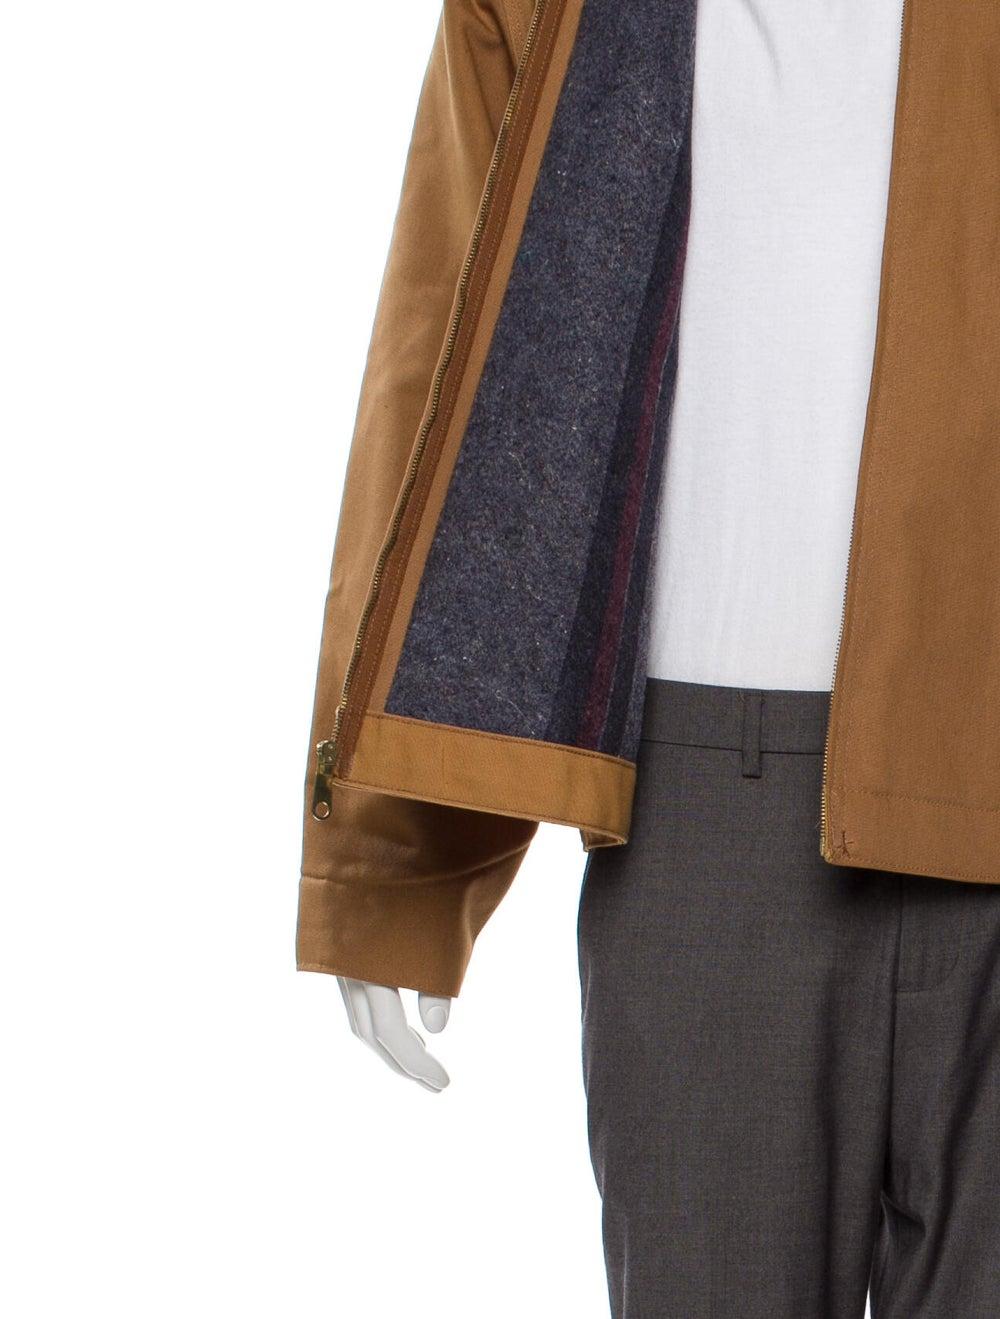 Carhartt Jacket - image 4